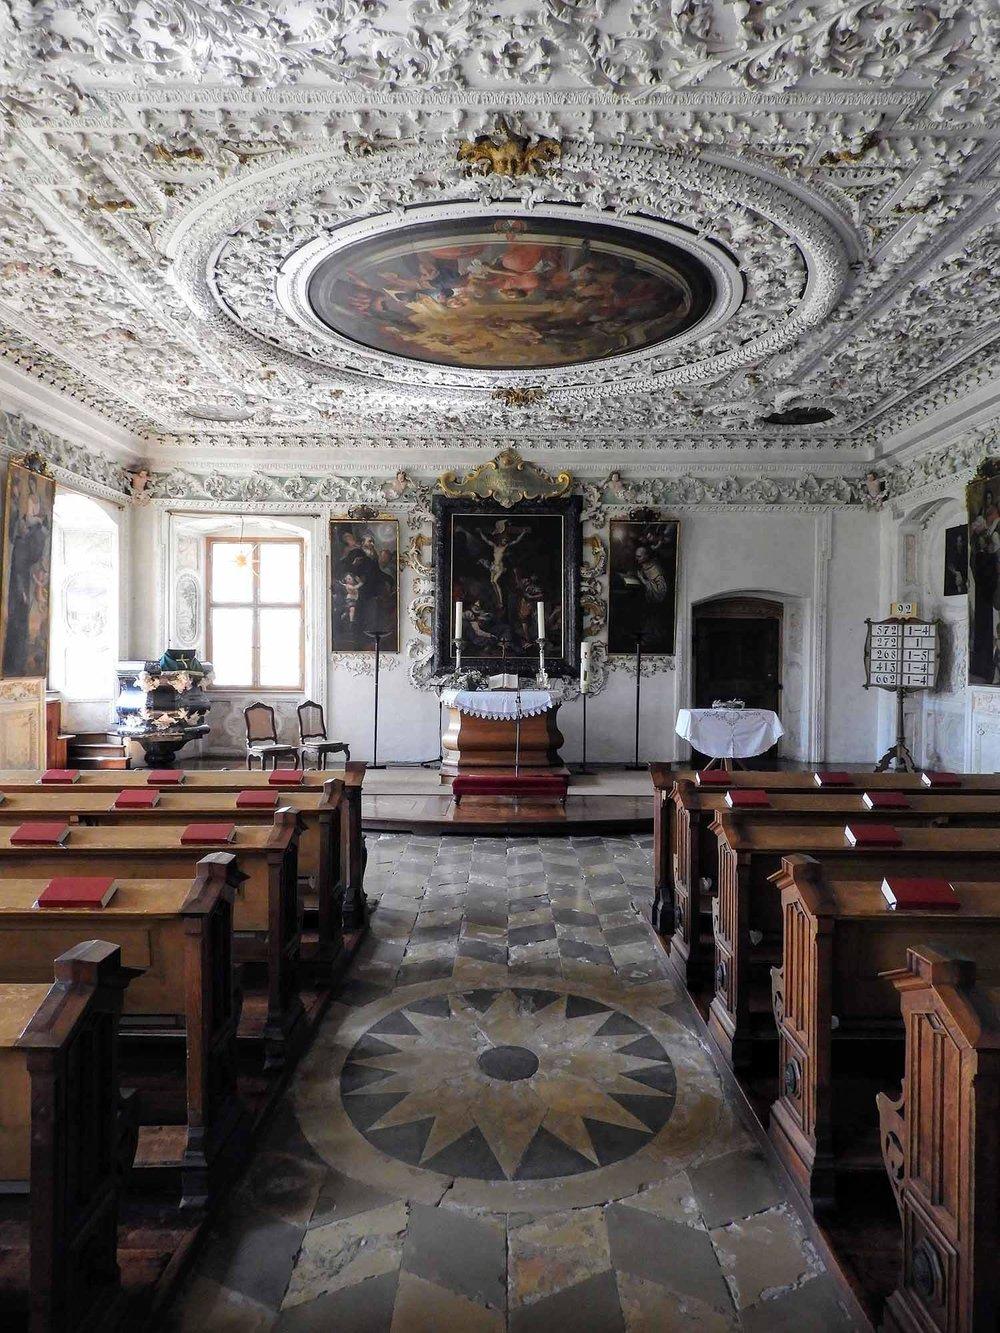 germany-salem-monastery-chaple.jpg